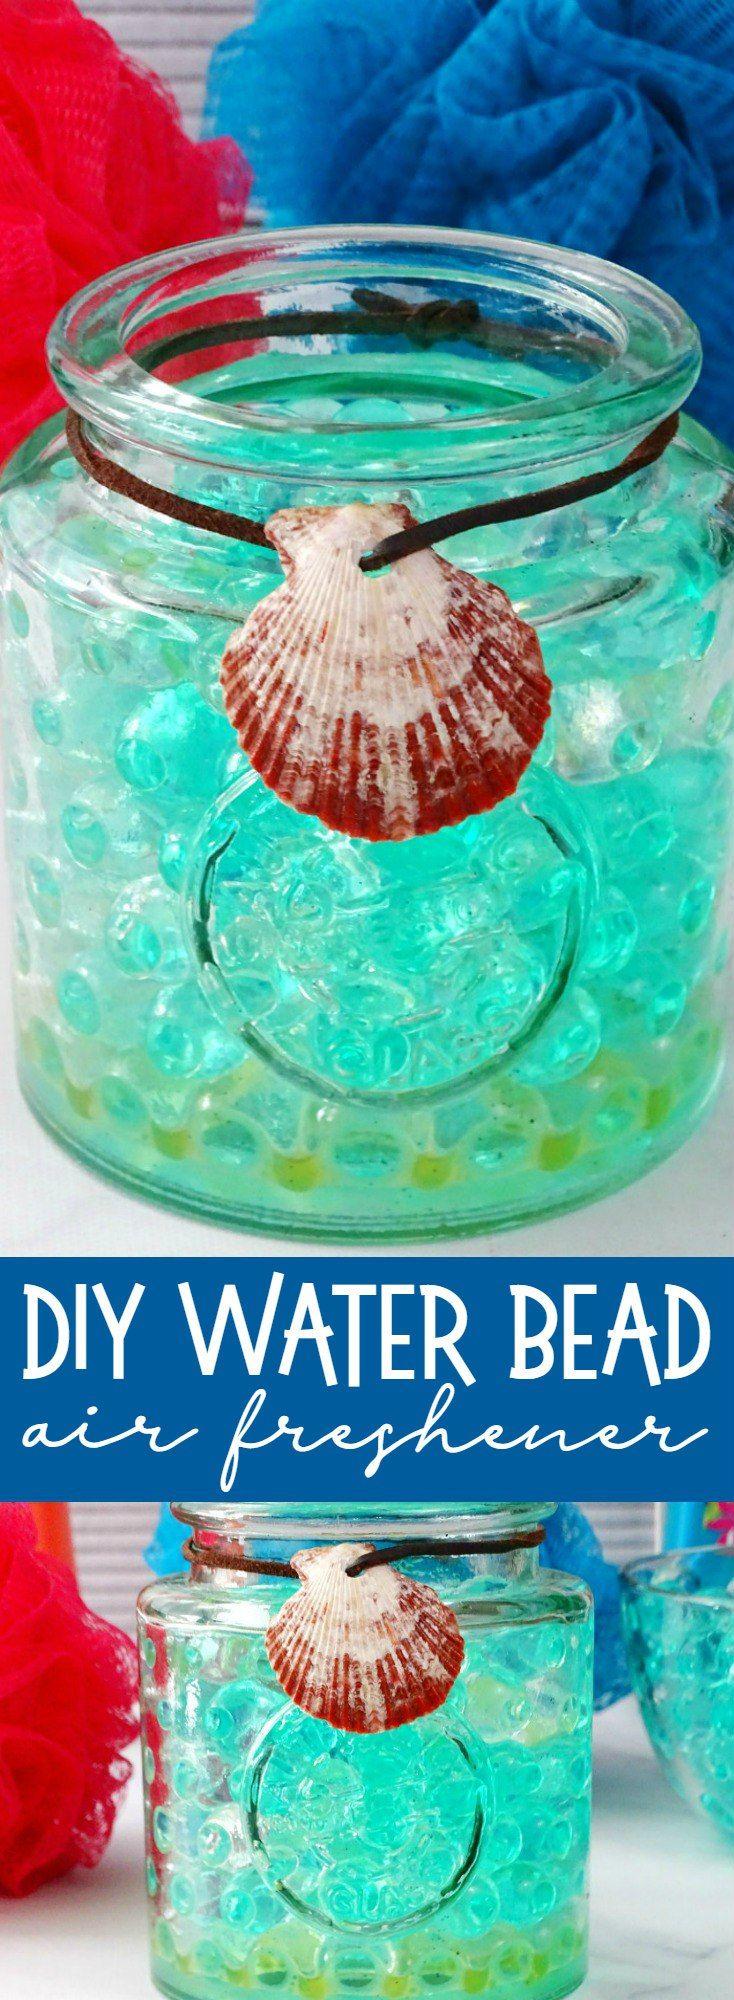 Diy water bead air freshener water beads diy fragrance